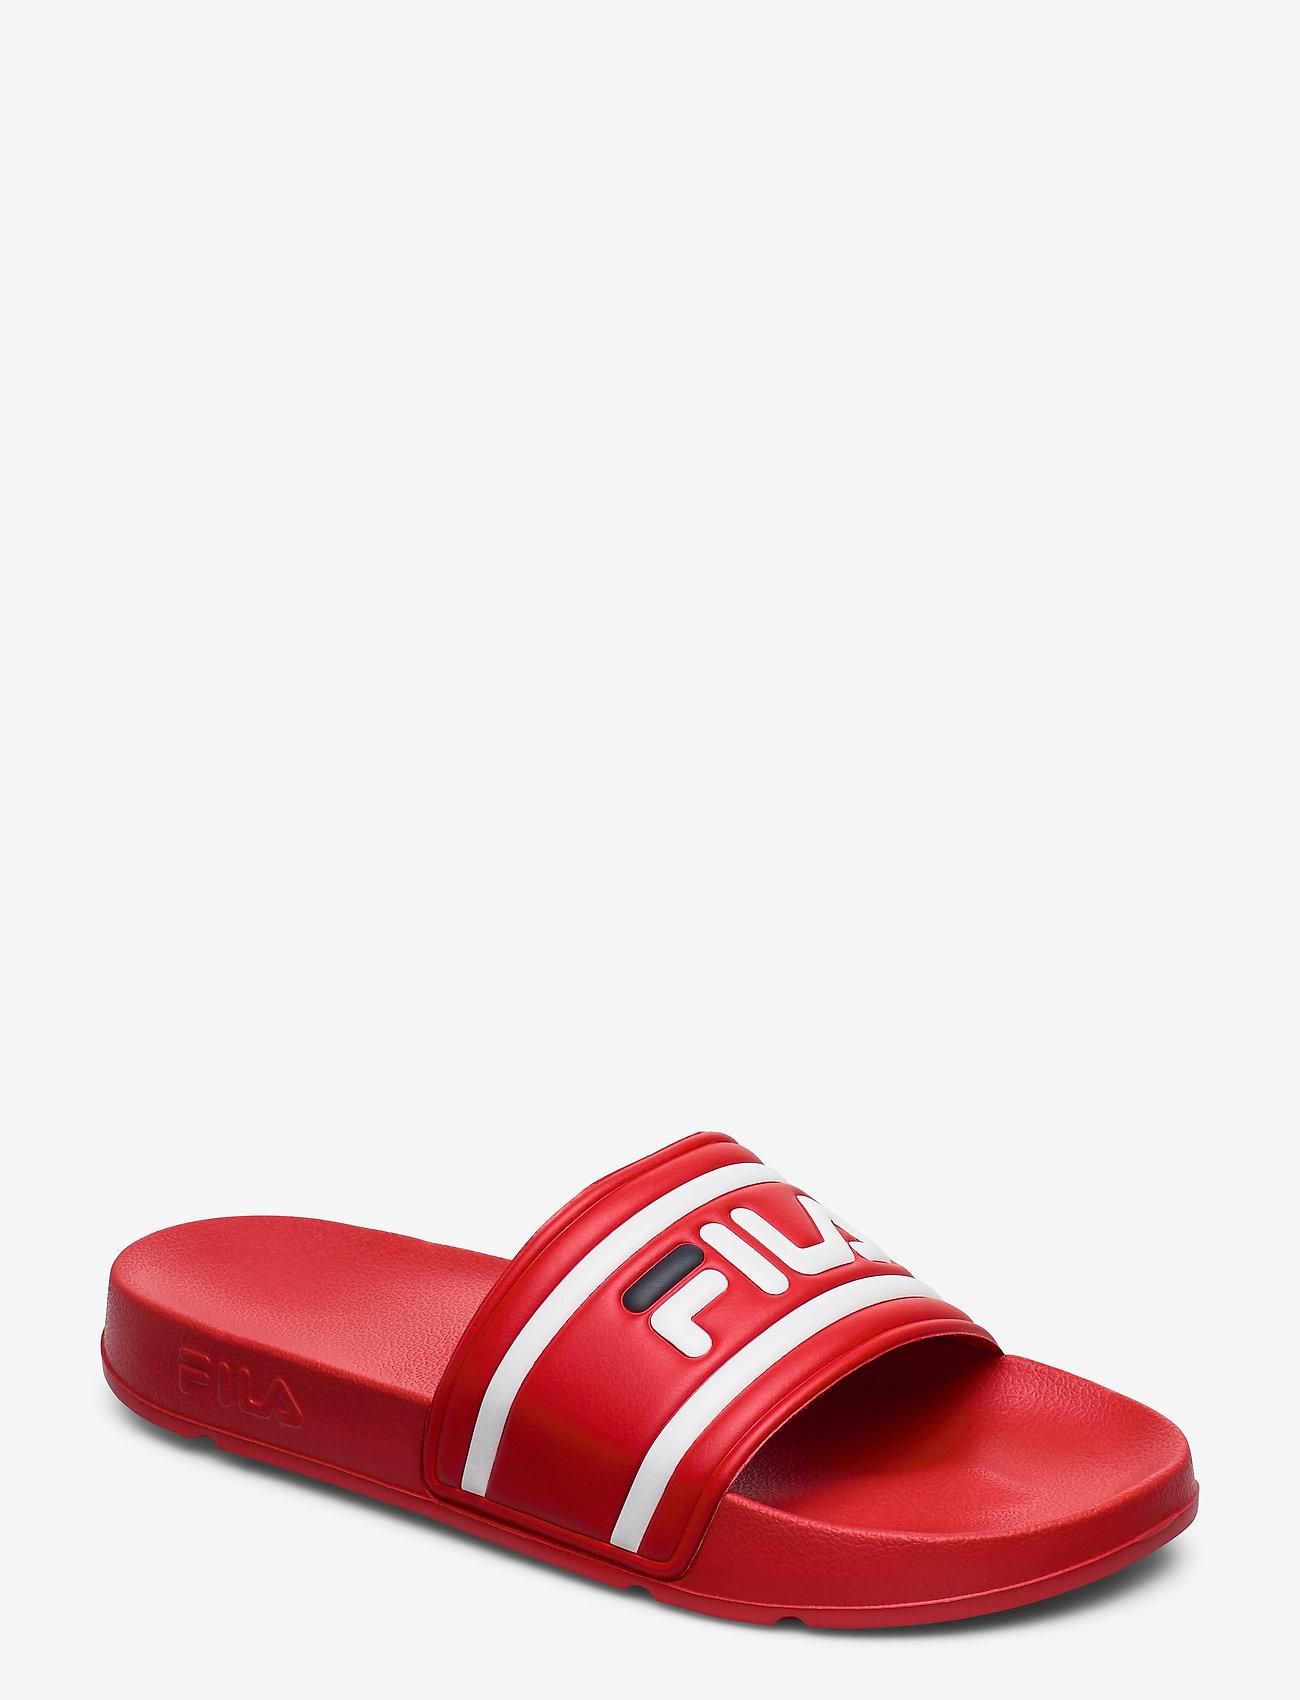 FILA - Morro Bay slipper 2.0 - pool sliders - fila red